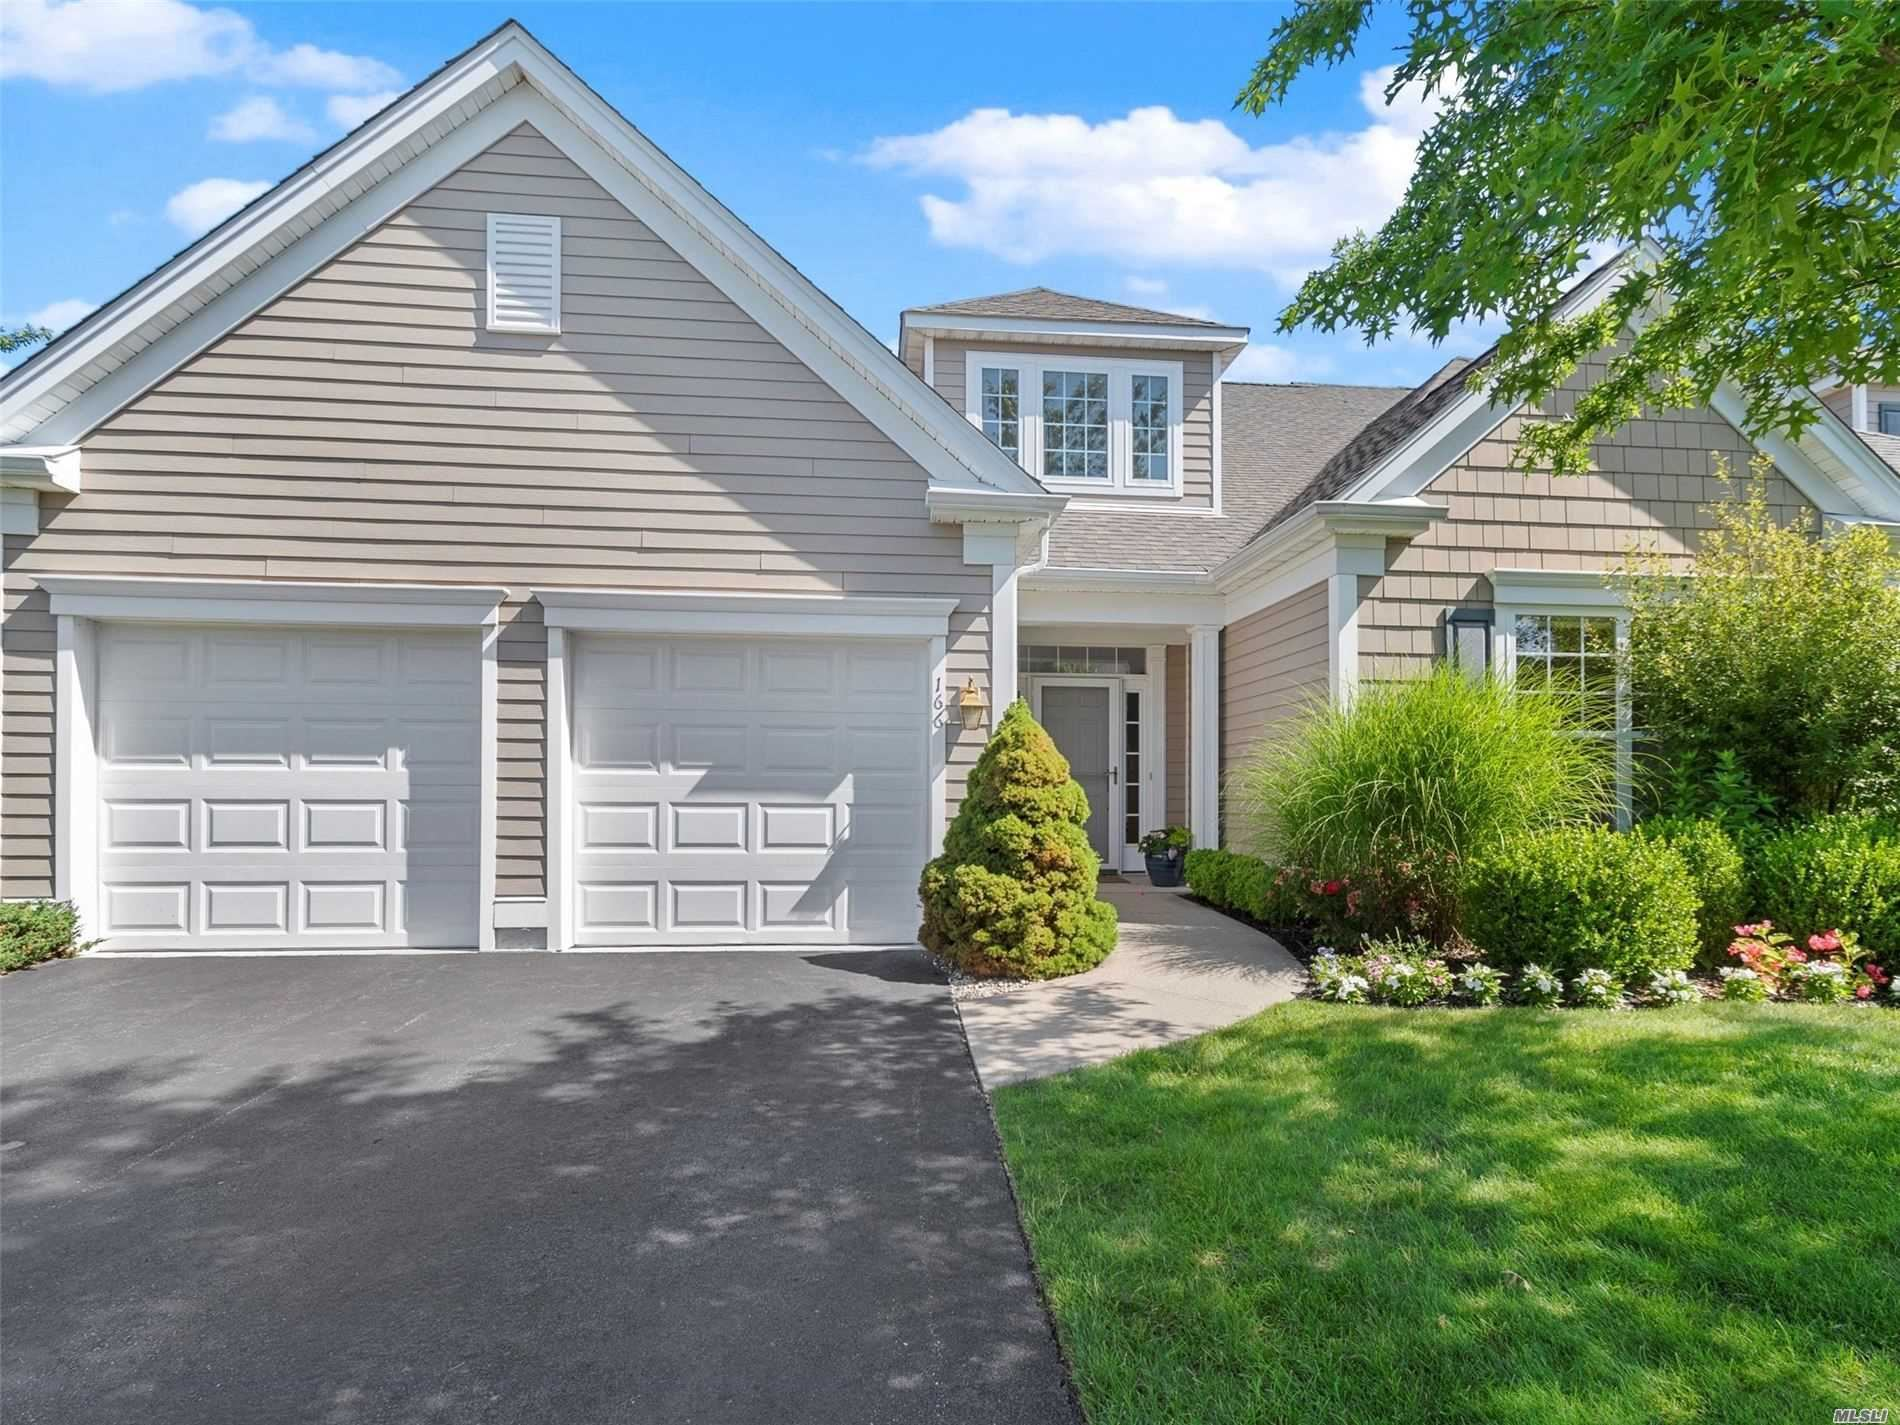 166 Jonathan Lane, Westhampton, NY 11977 - MLS#: 3235343